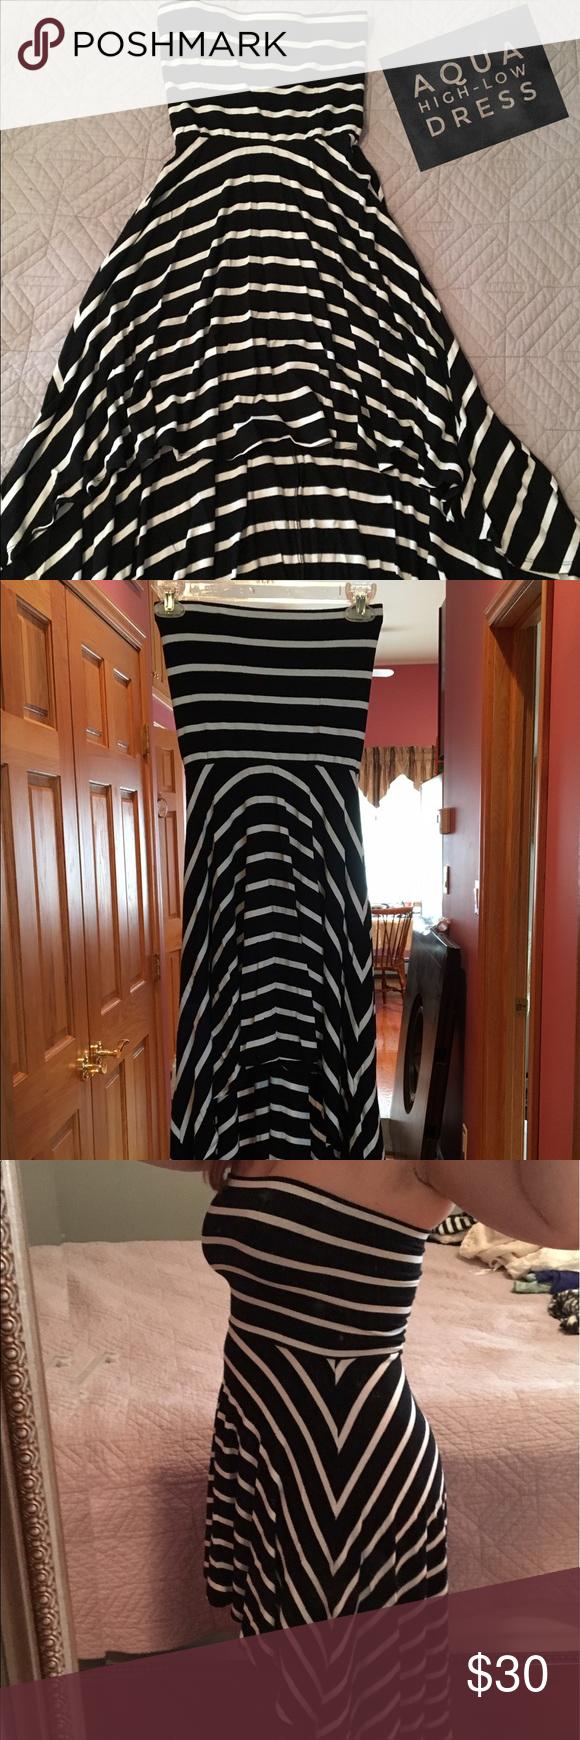 Aqua high-low strapless dress 👗 Stripped aqua high low dress, very comfortable . Elastic at the top. Size small Aqua Dresses High Low